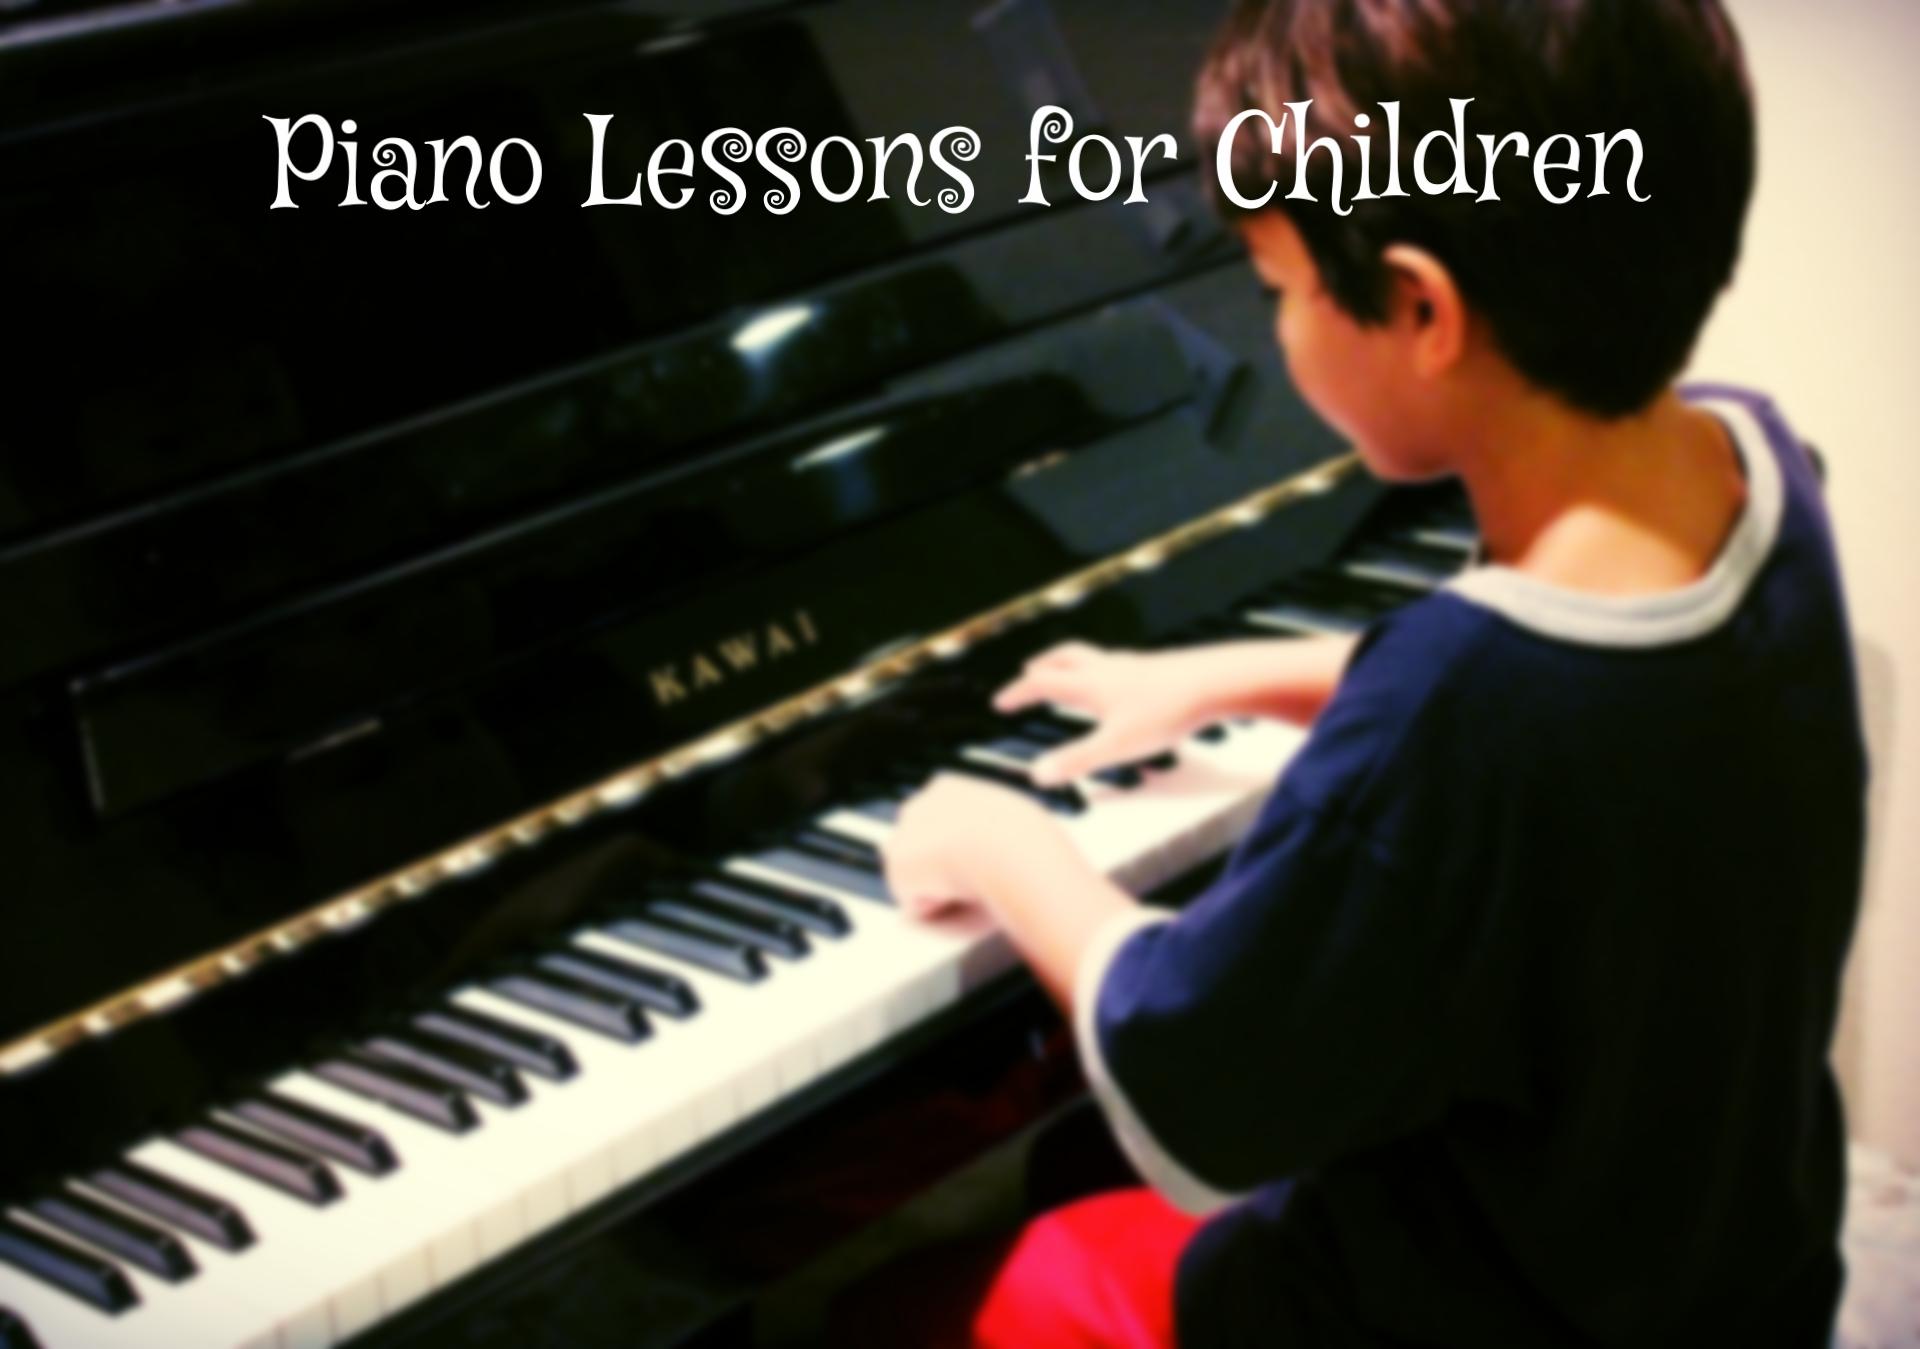 piano-boy-78492_1920_pexels.jpg